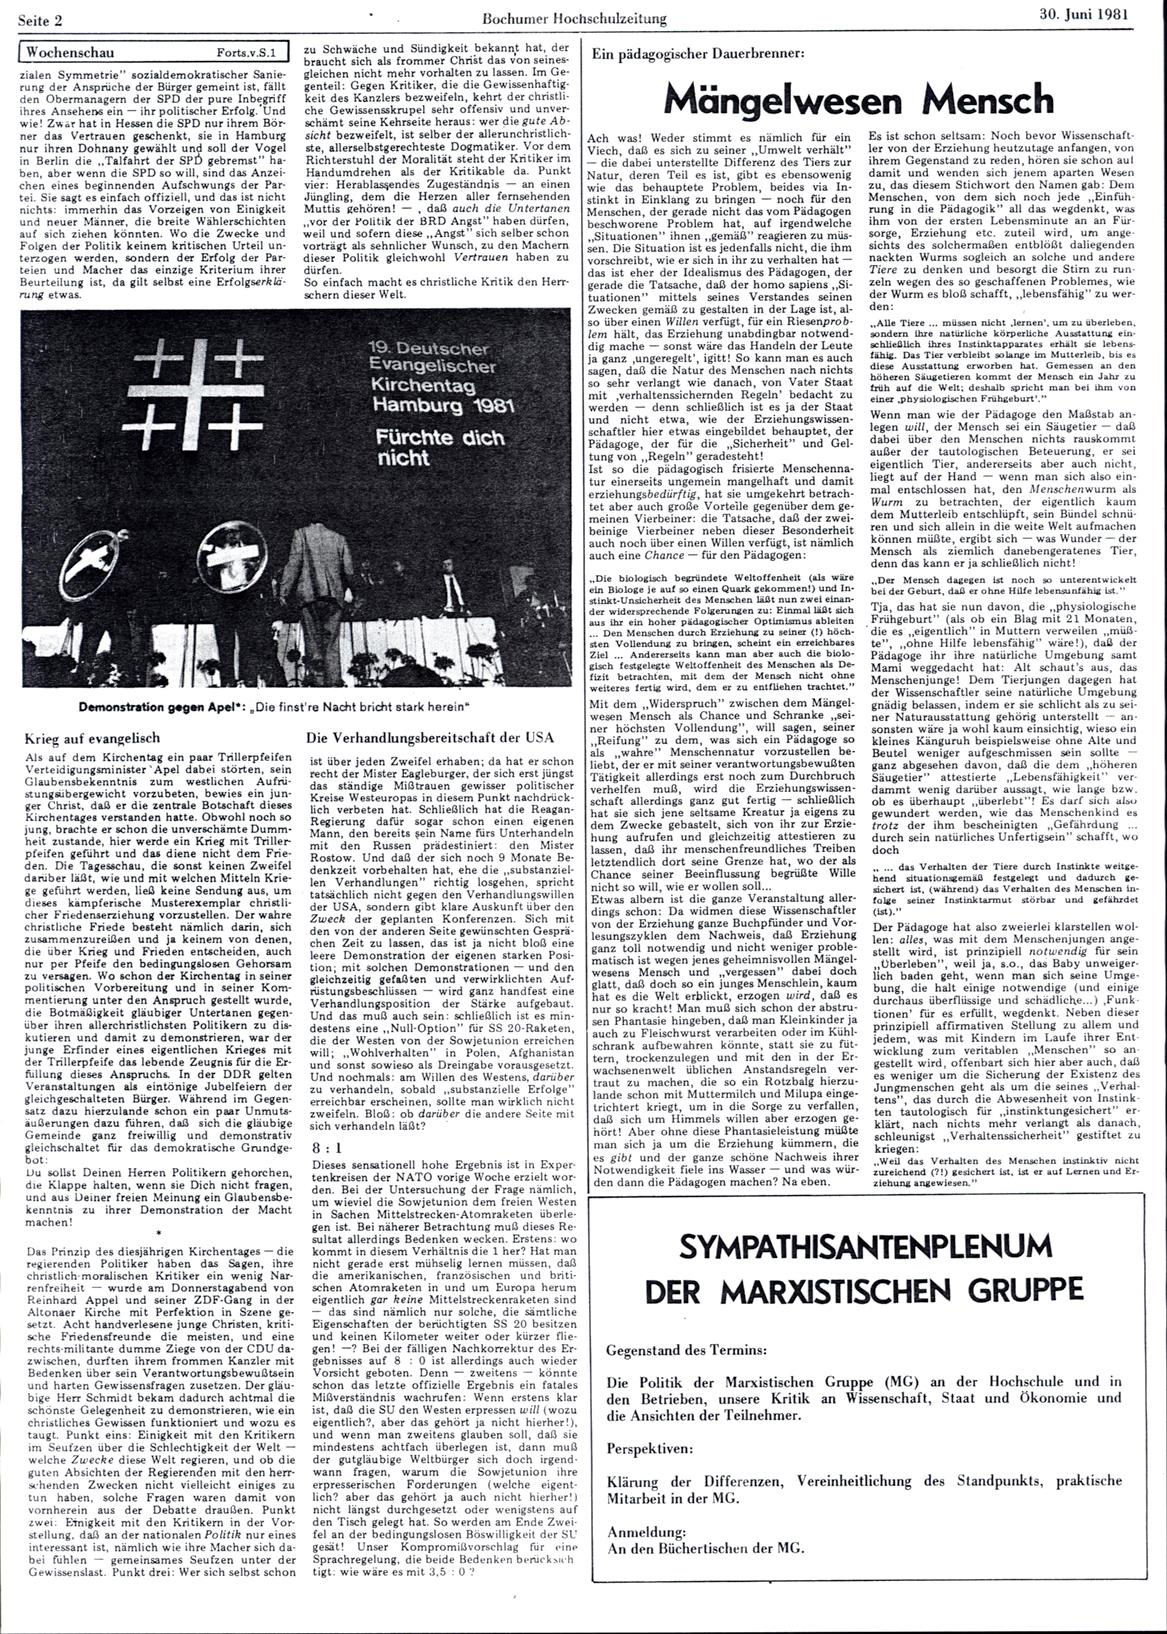 Bochum_BHZ_19810630_035_002